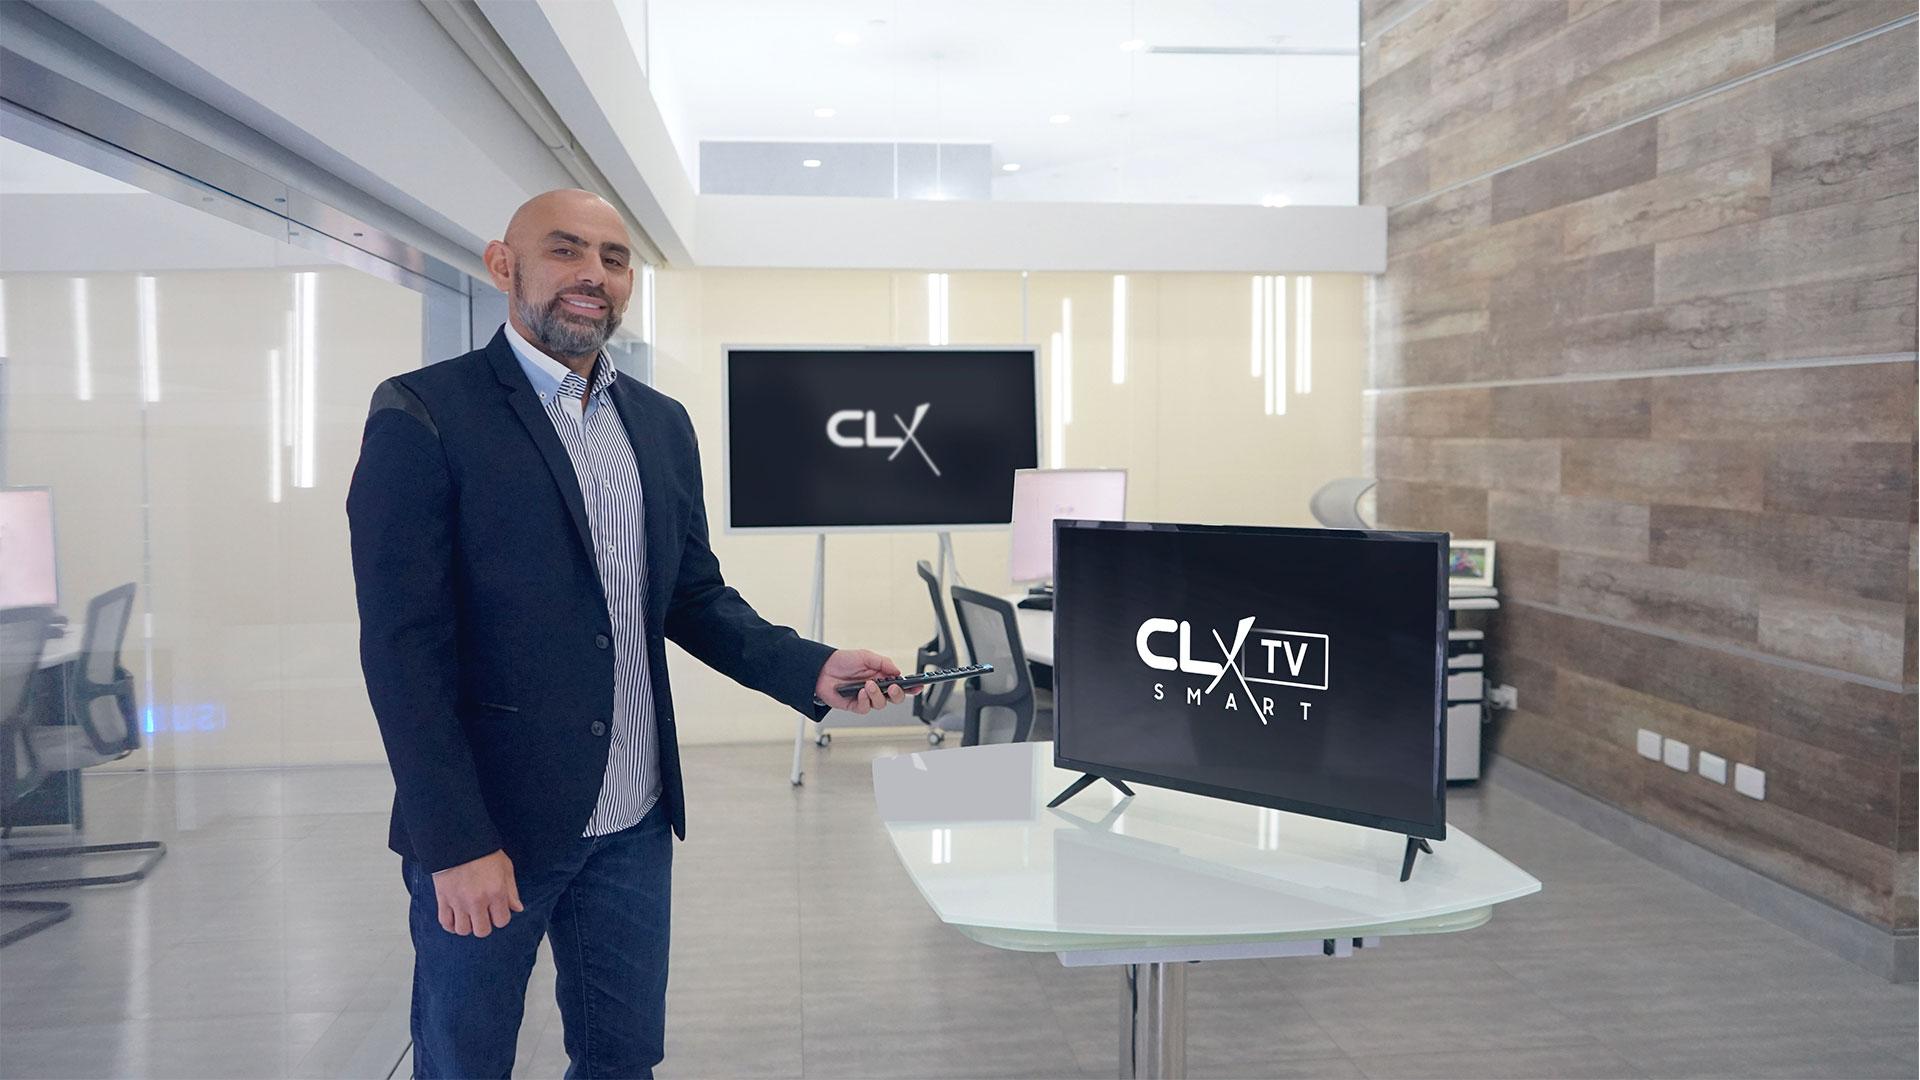 Led TV Smart CLX - Artech Digital